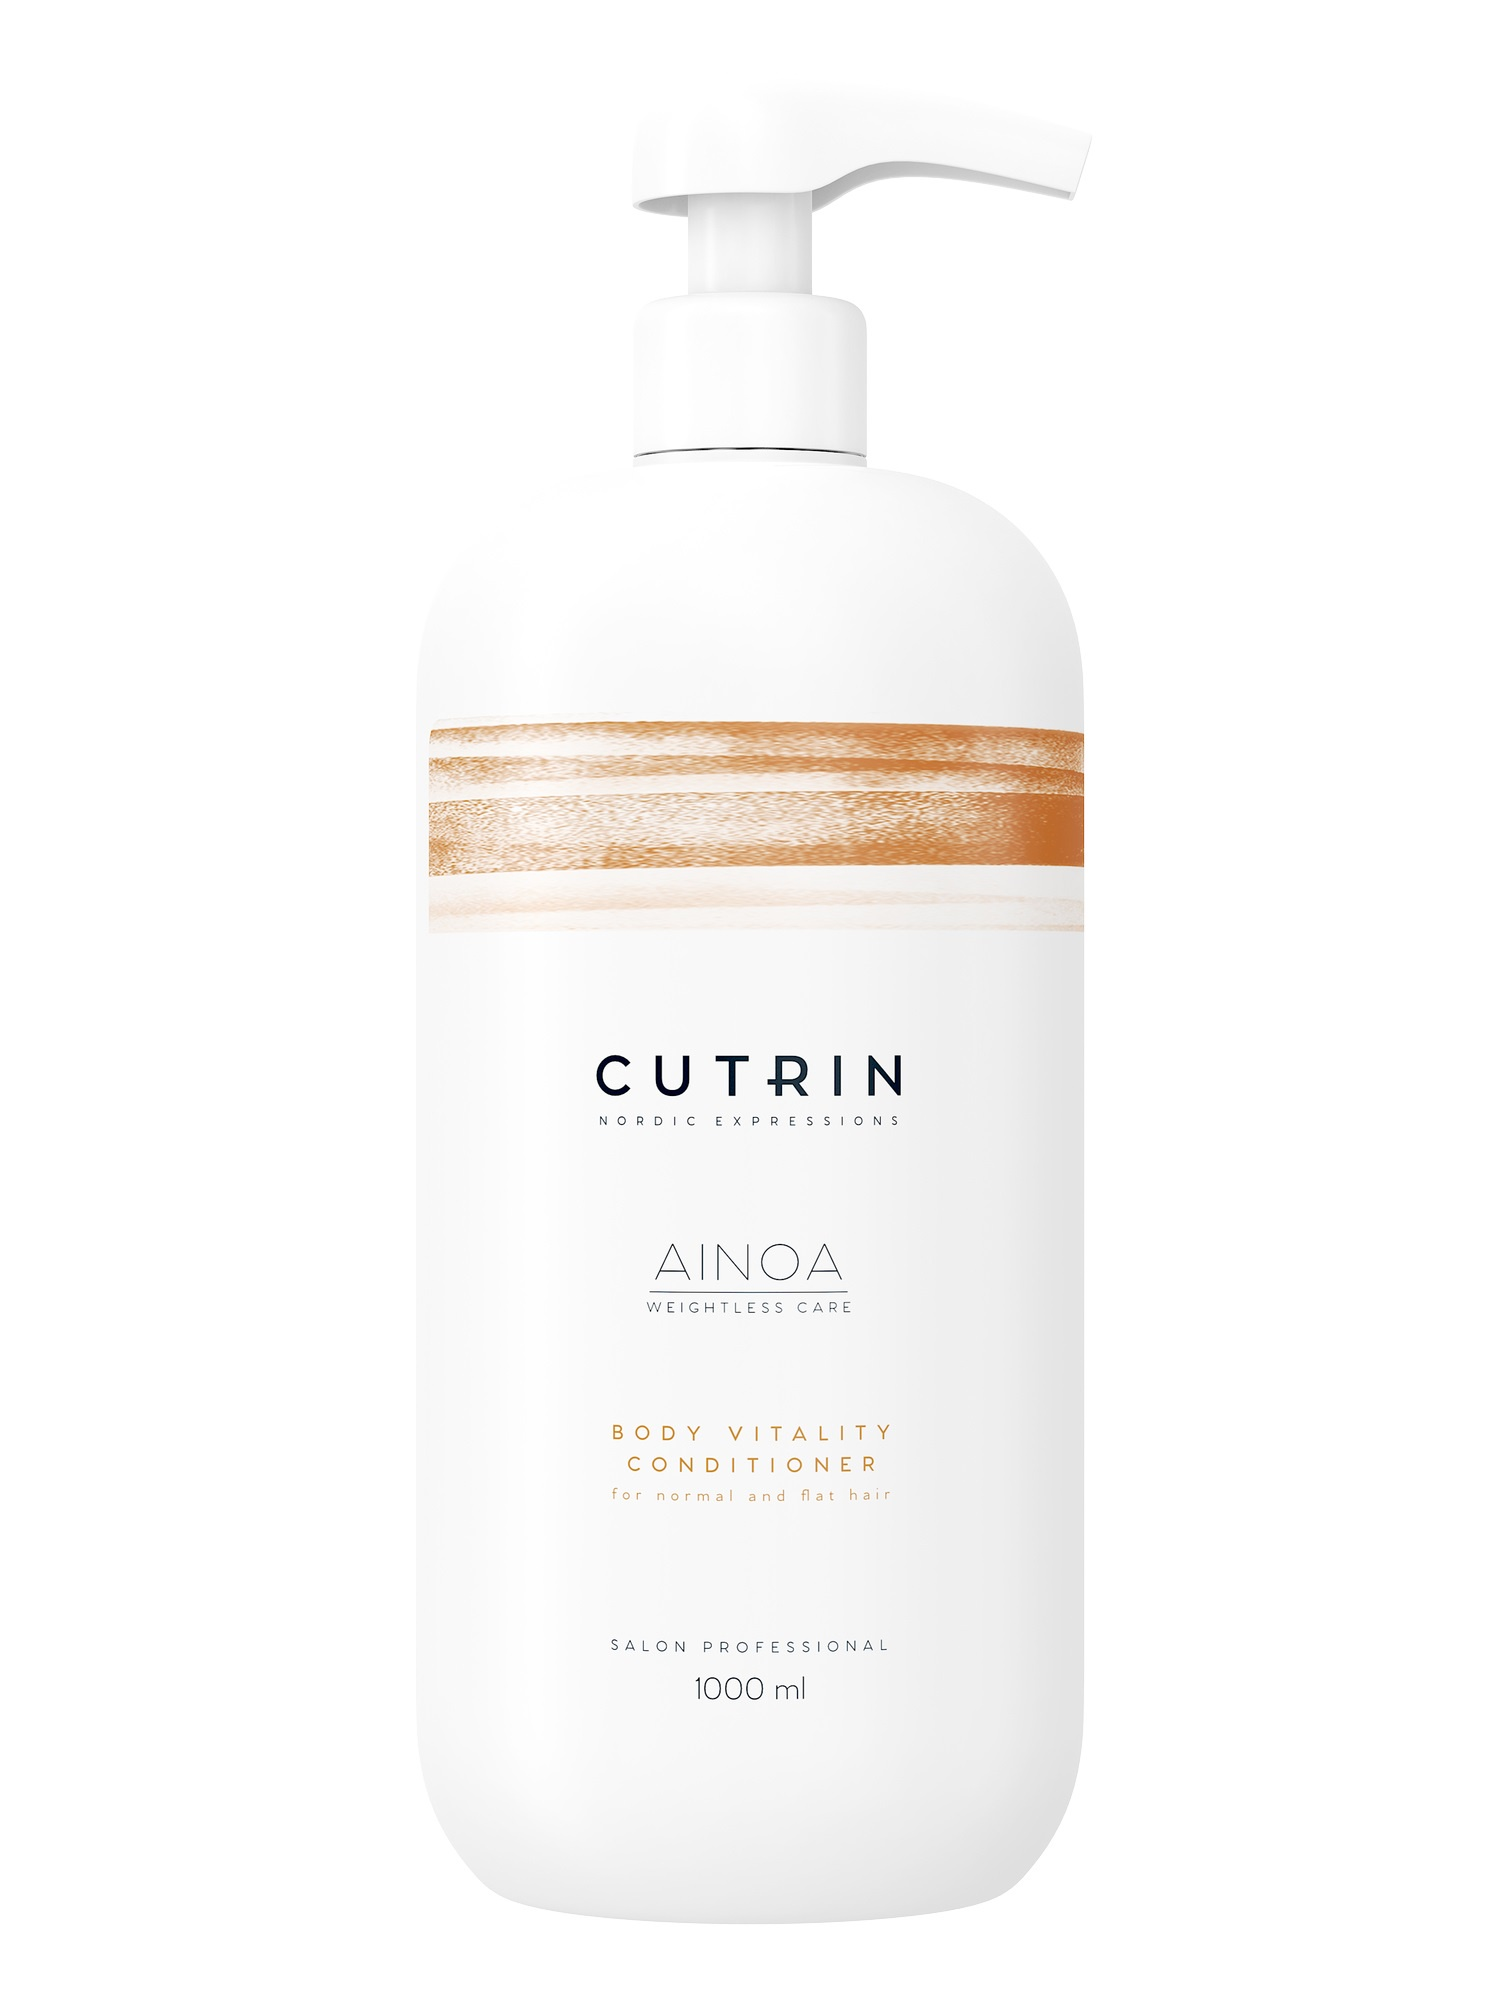 Кондиционер для волос CUTRIN AINOA для укрепления body vitality 1000 мл